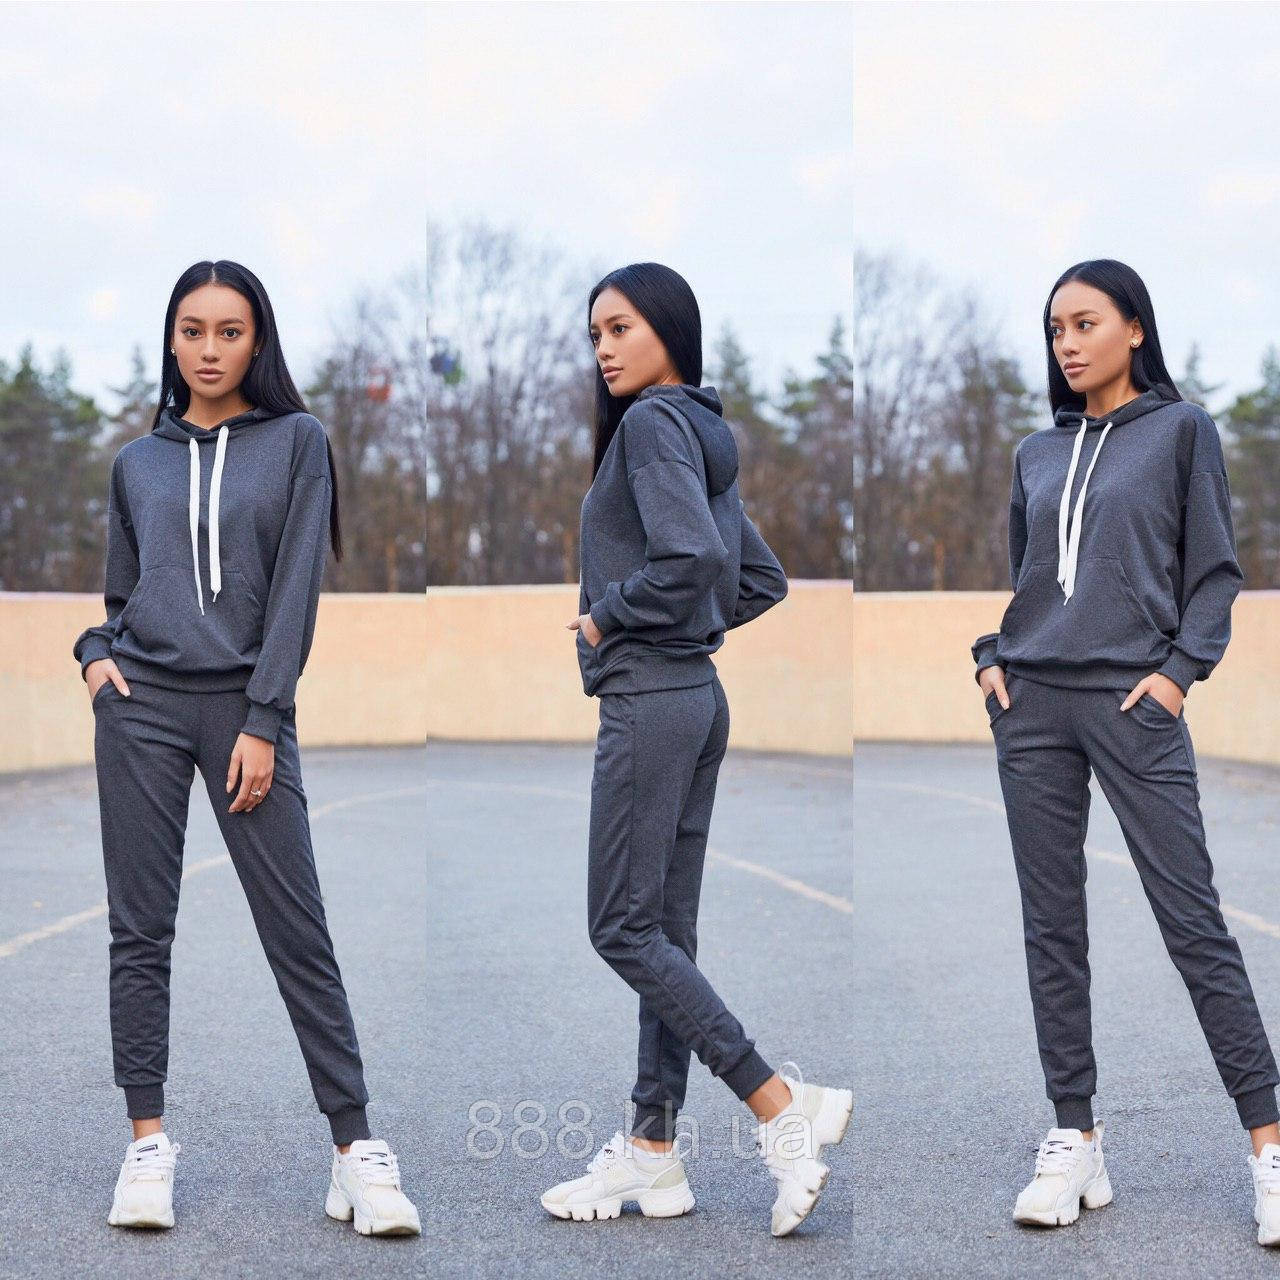 Женский спортивный костюм, костюм для прогулок S/M/L/XL (серый)